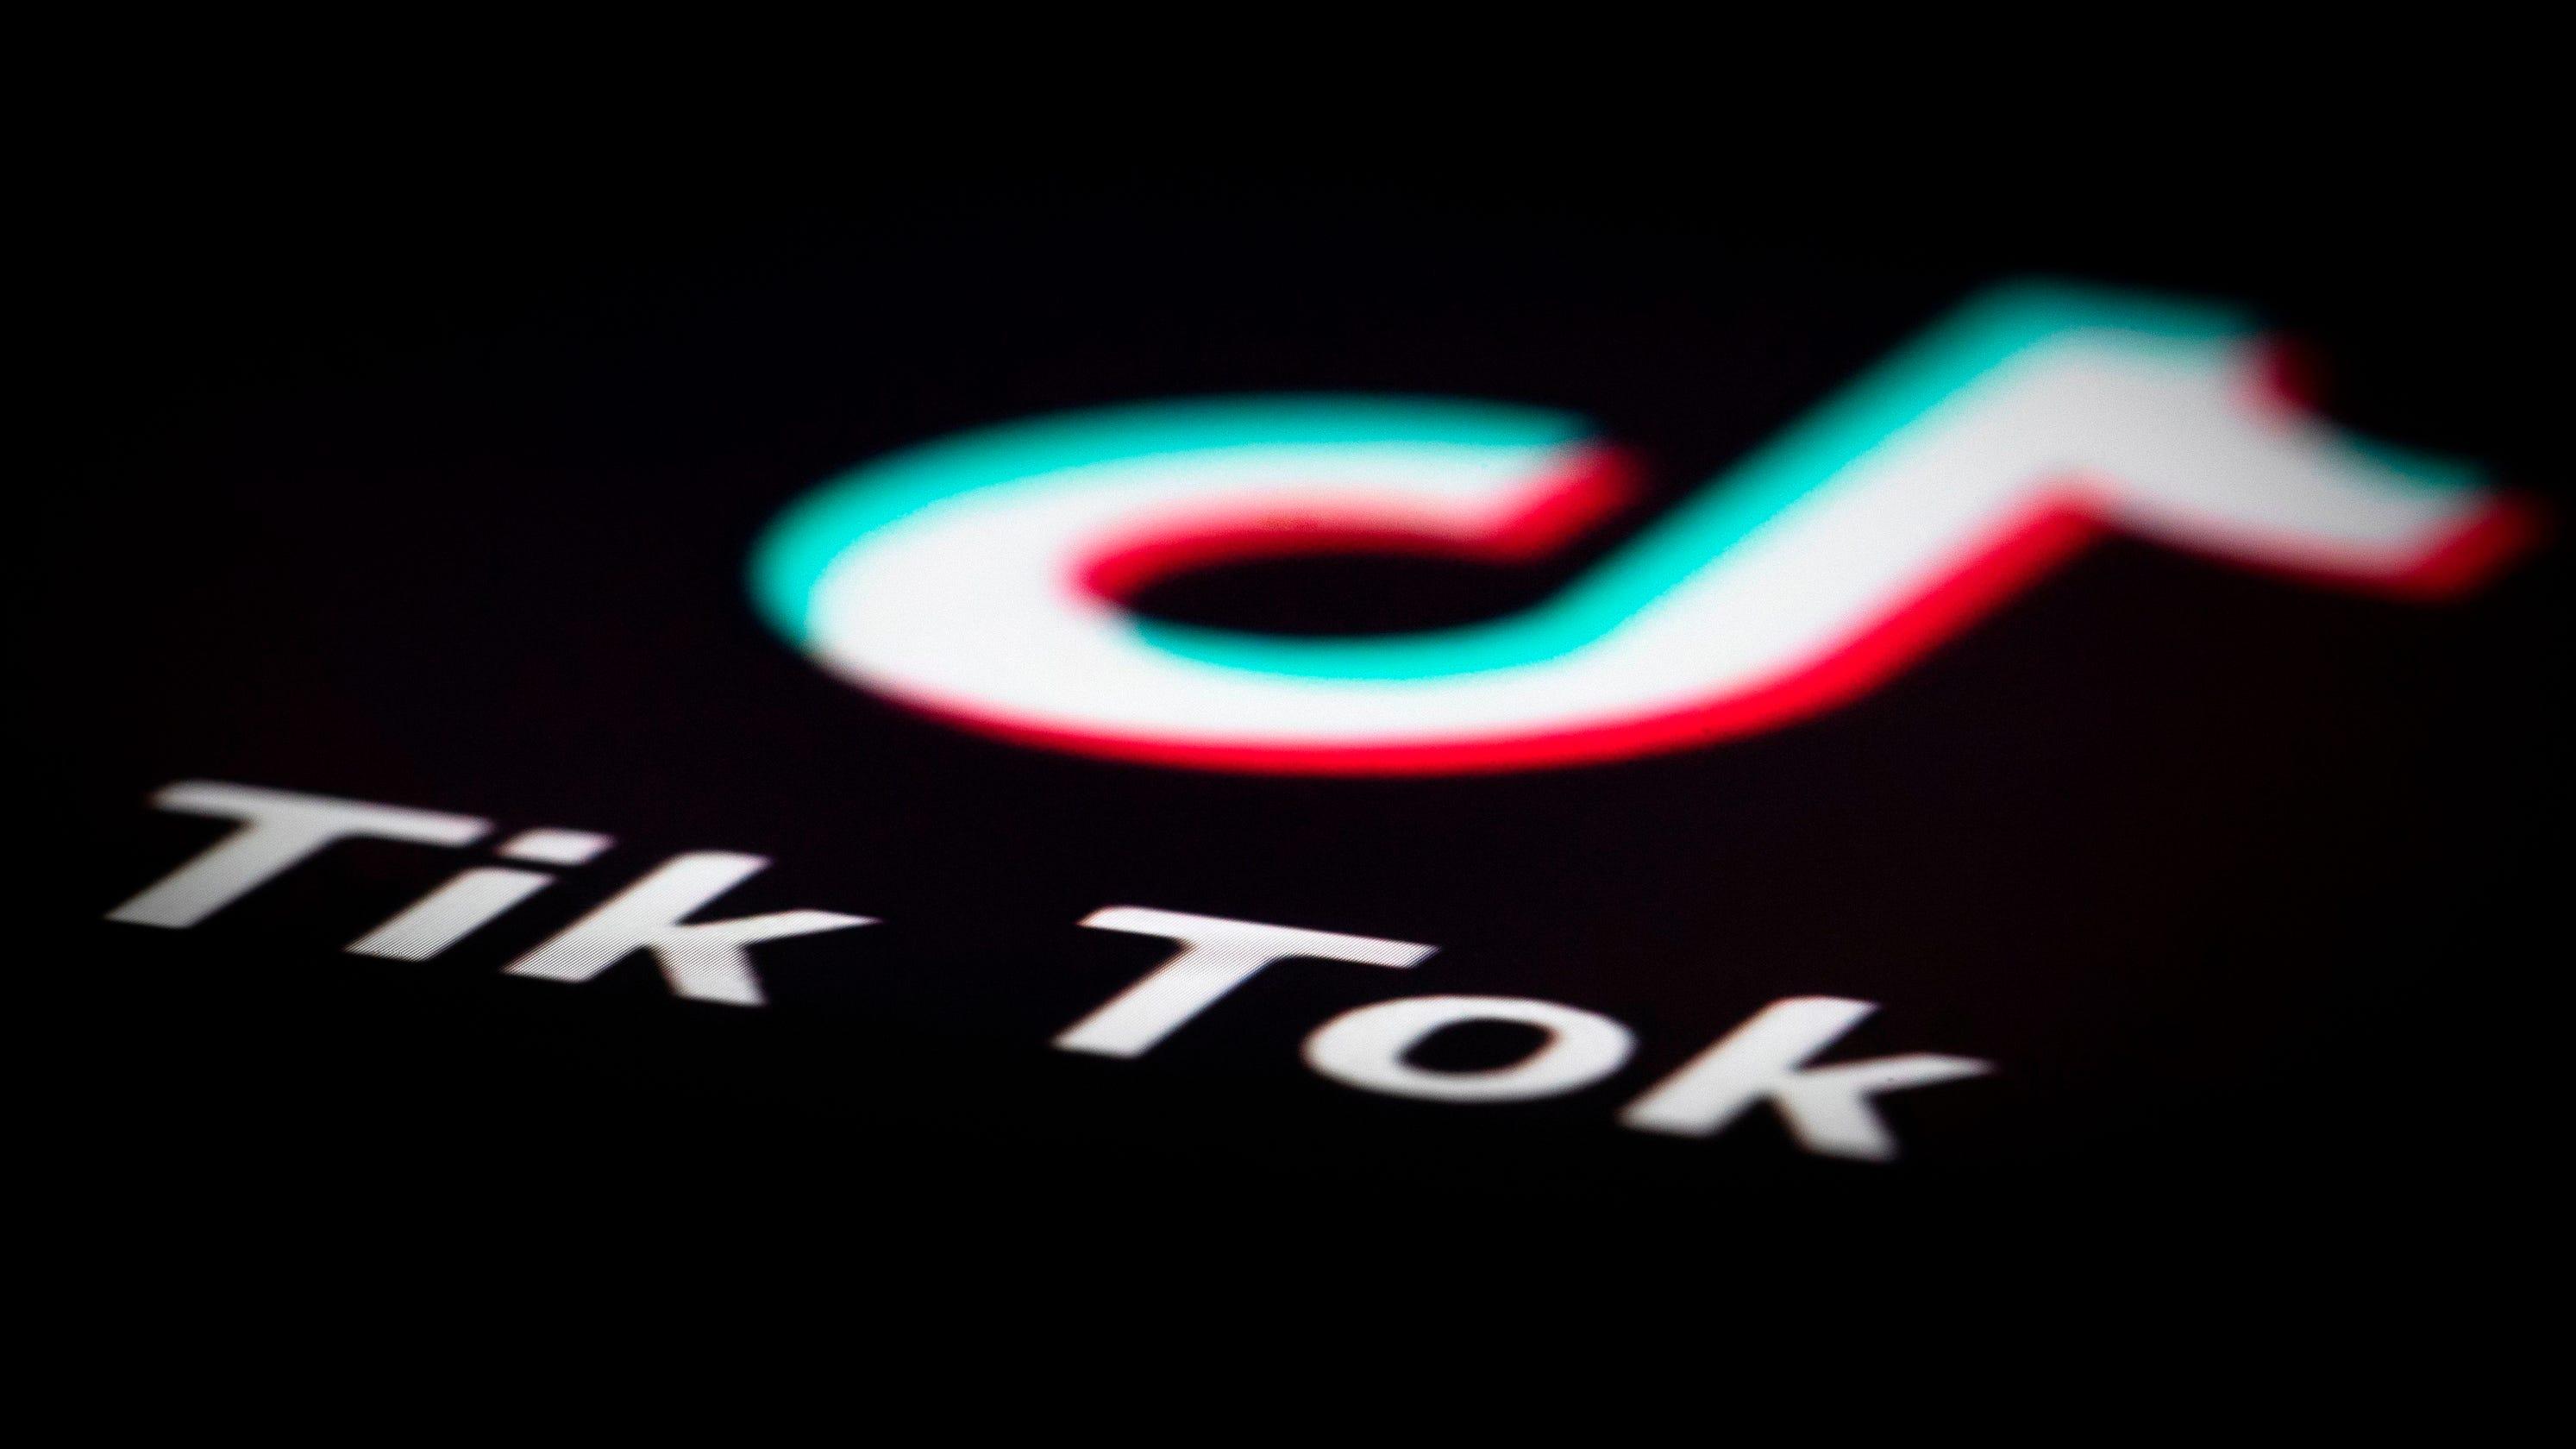 Judge postpones Trump's TikTok ban